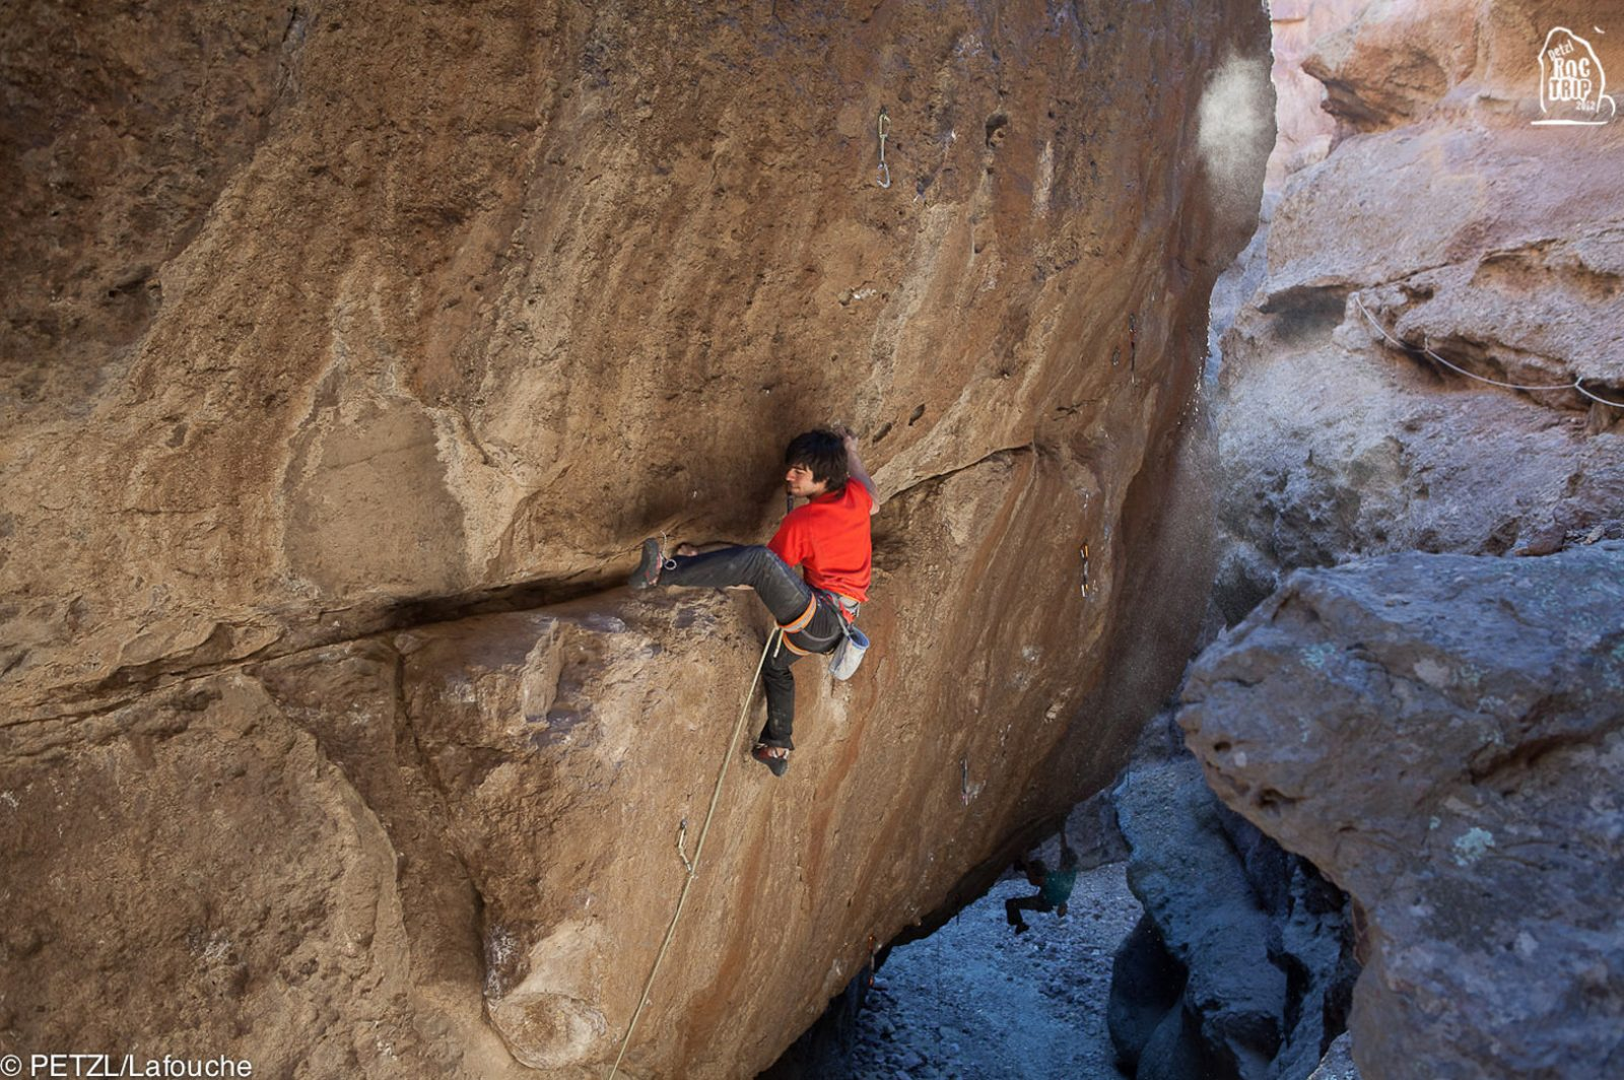 Petzl RocTrip Argentina 2012 - Jon Cardwell on la Buitrera Canyon - ©Lafouche